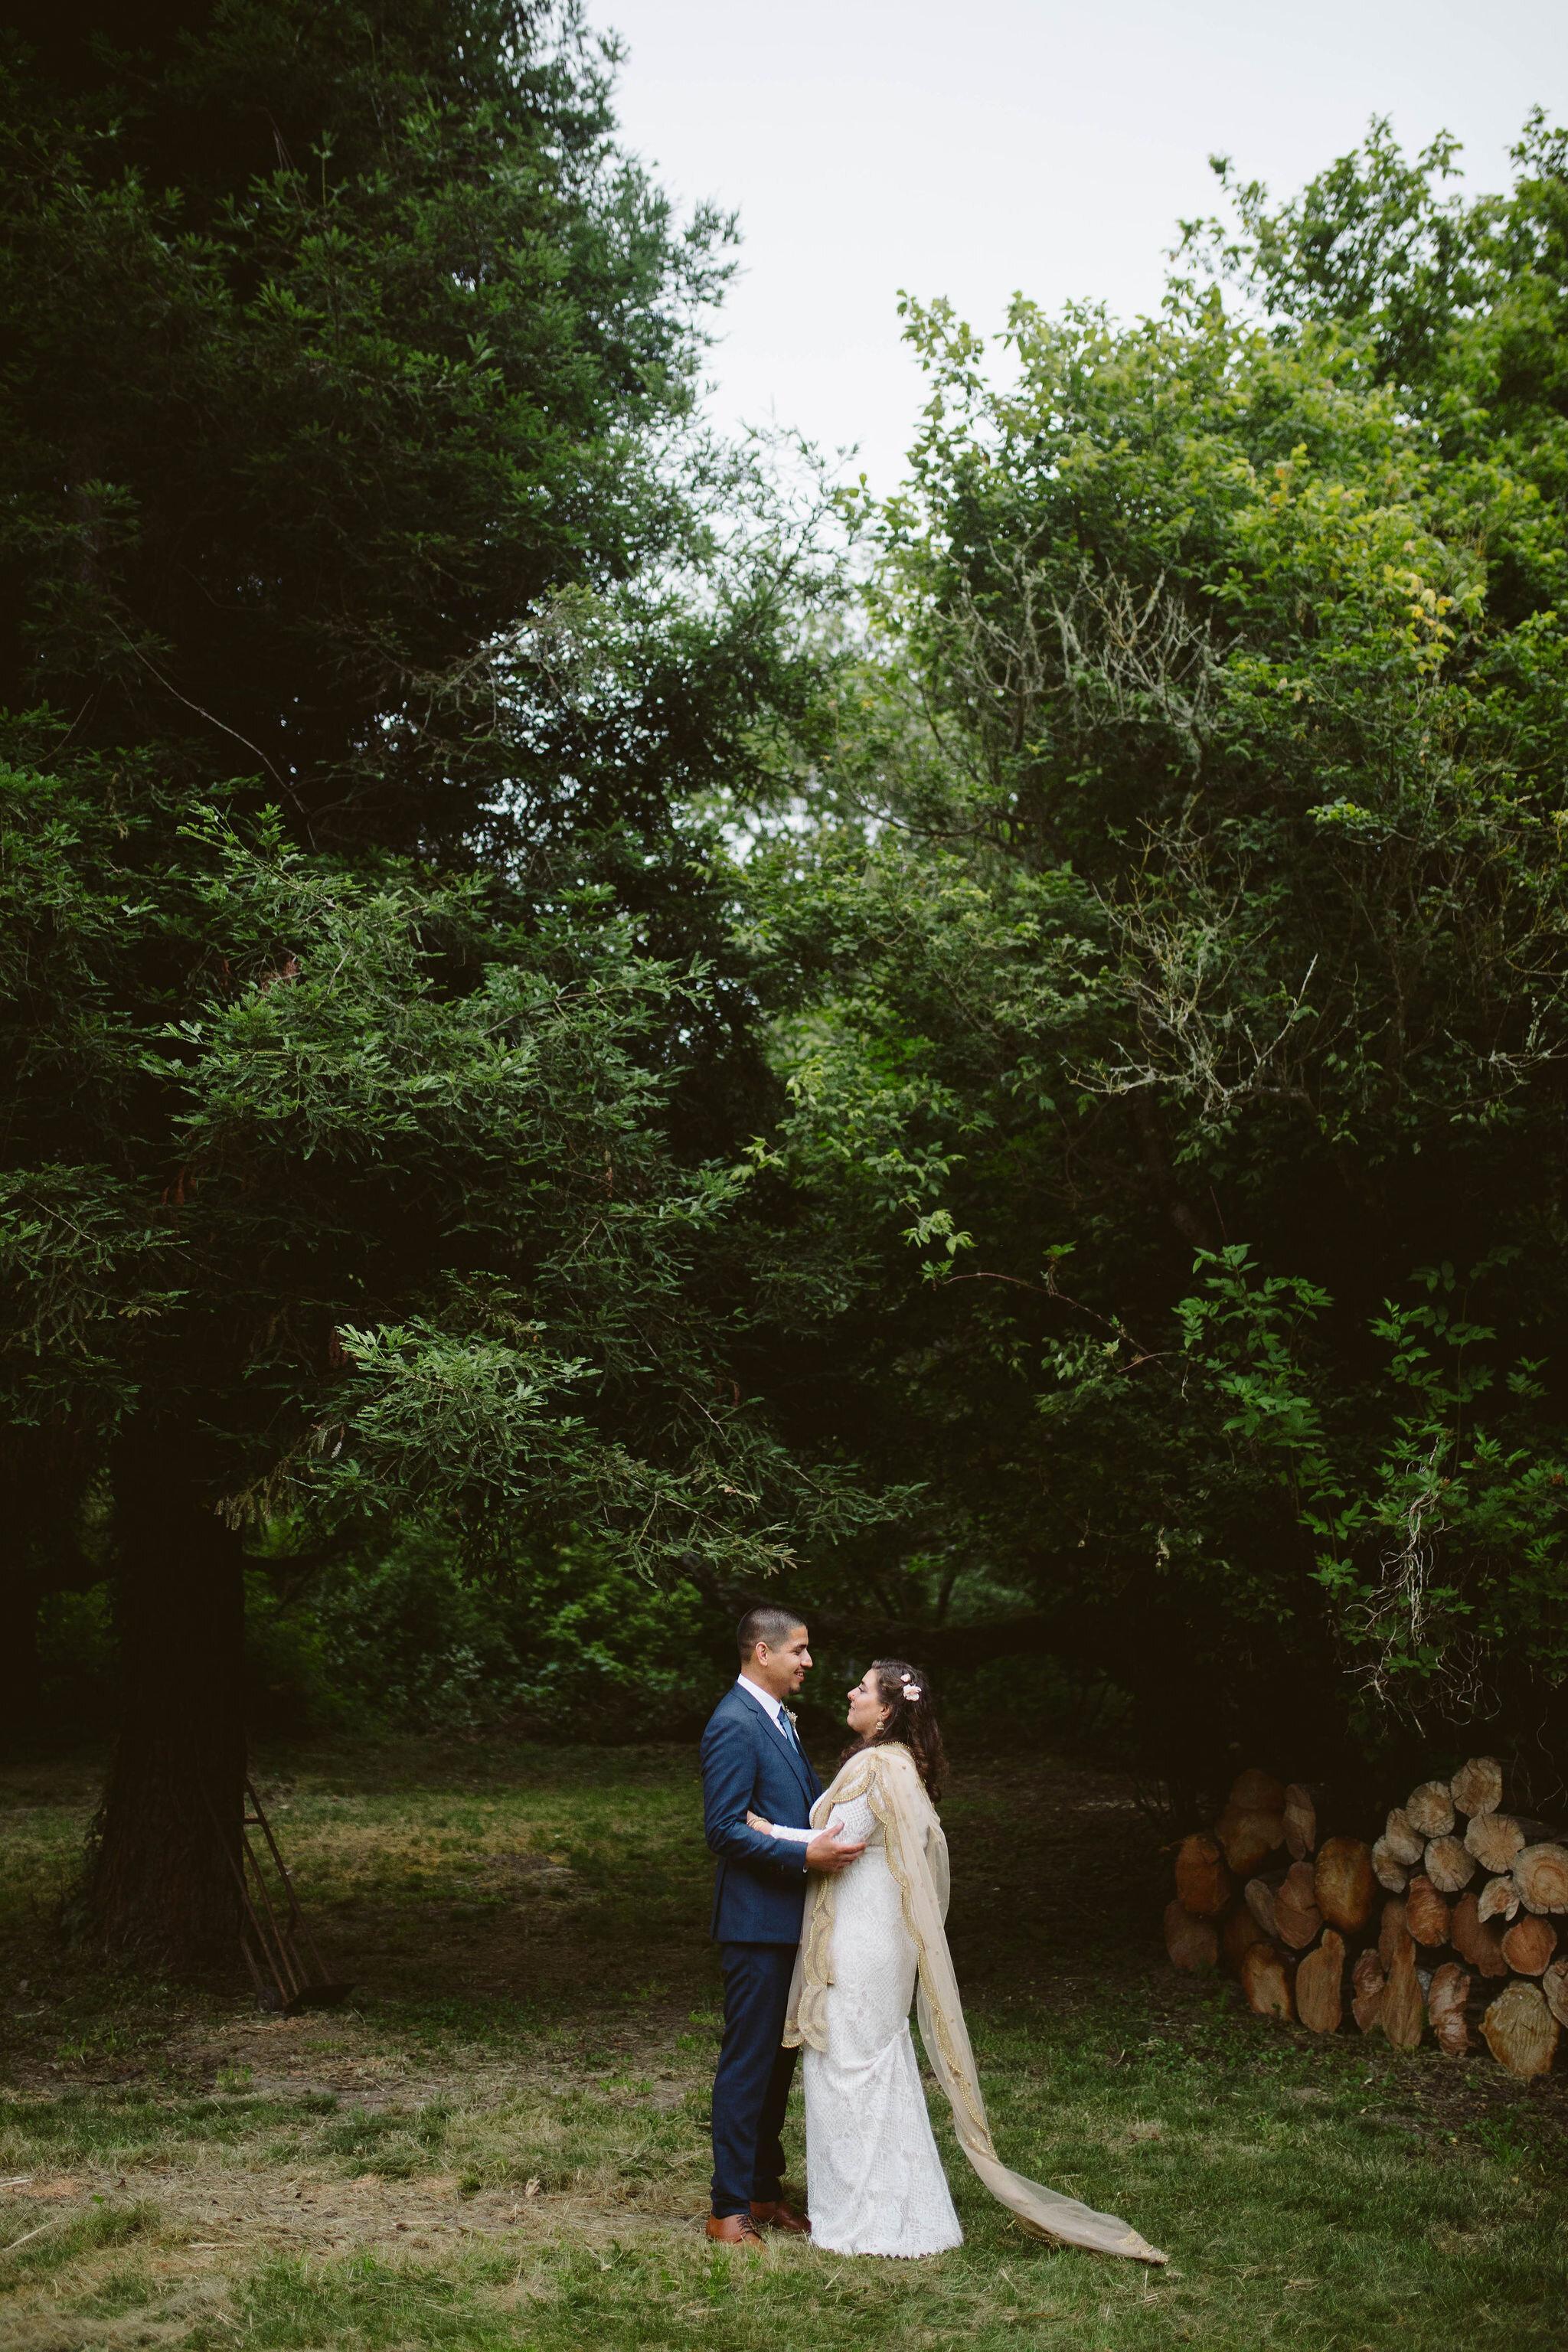 Venture-Retreat-Center-Wedding-Pescadero-Sat-Aaron-Pritam-The-Shalom-Imaginative-810.jpg